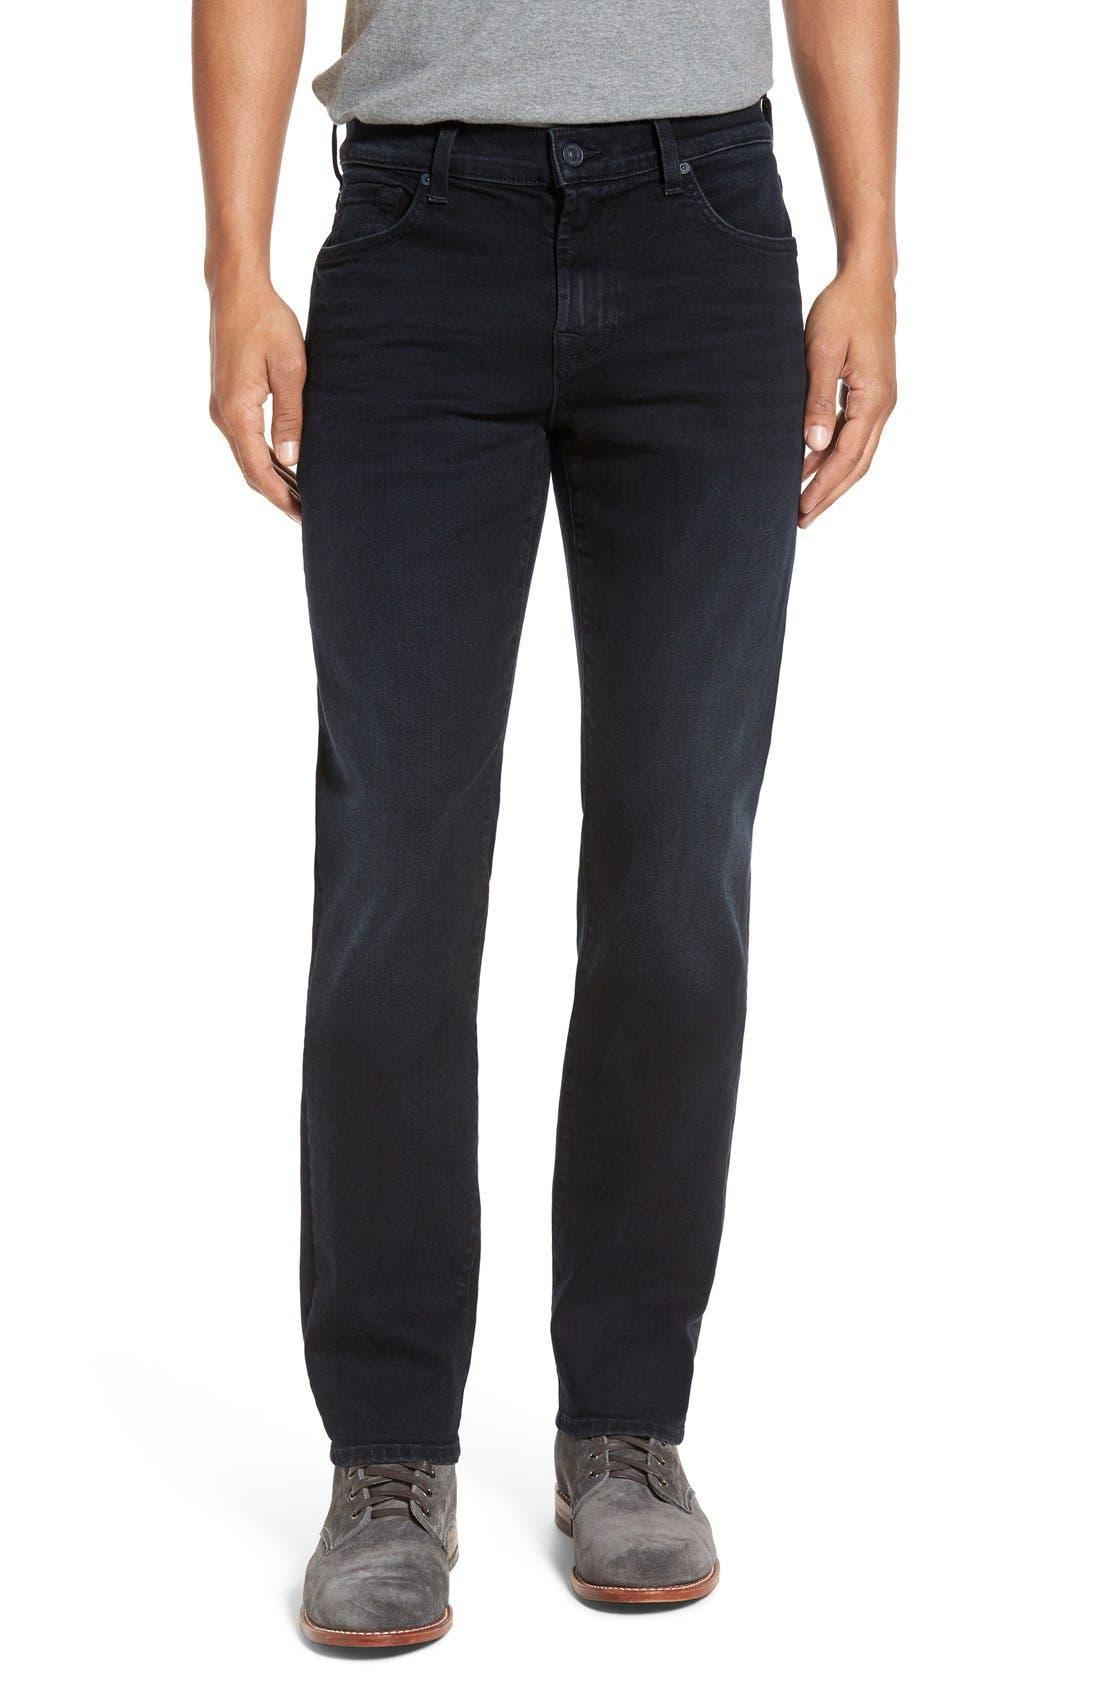 'Slimmy - Luxe Performance' Slim Fit Jeans,                             Main thumbnail 1, color,                             Stockholme